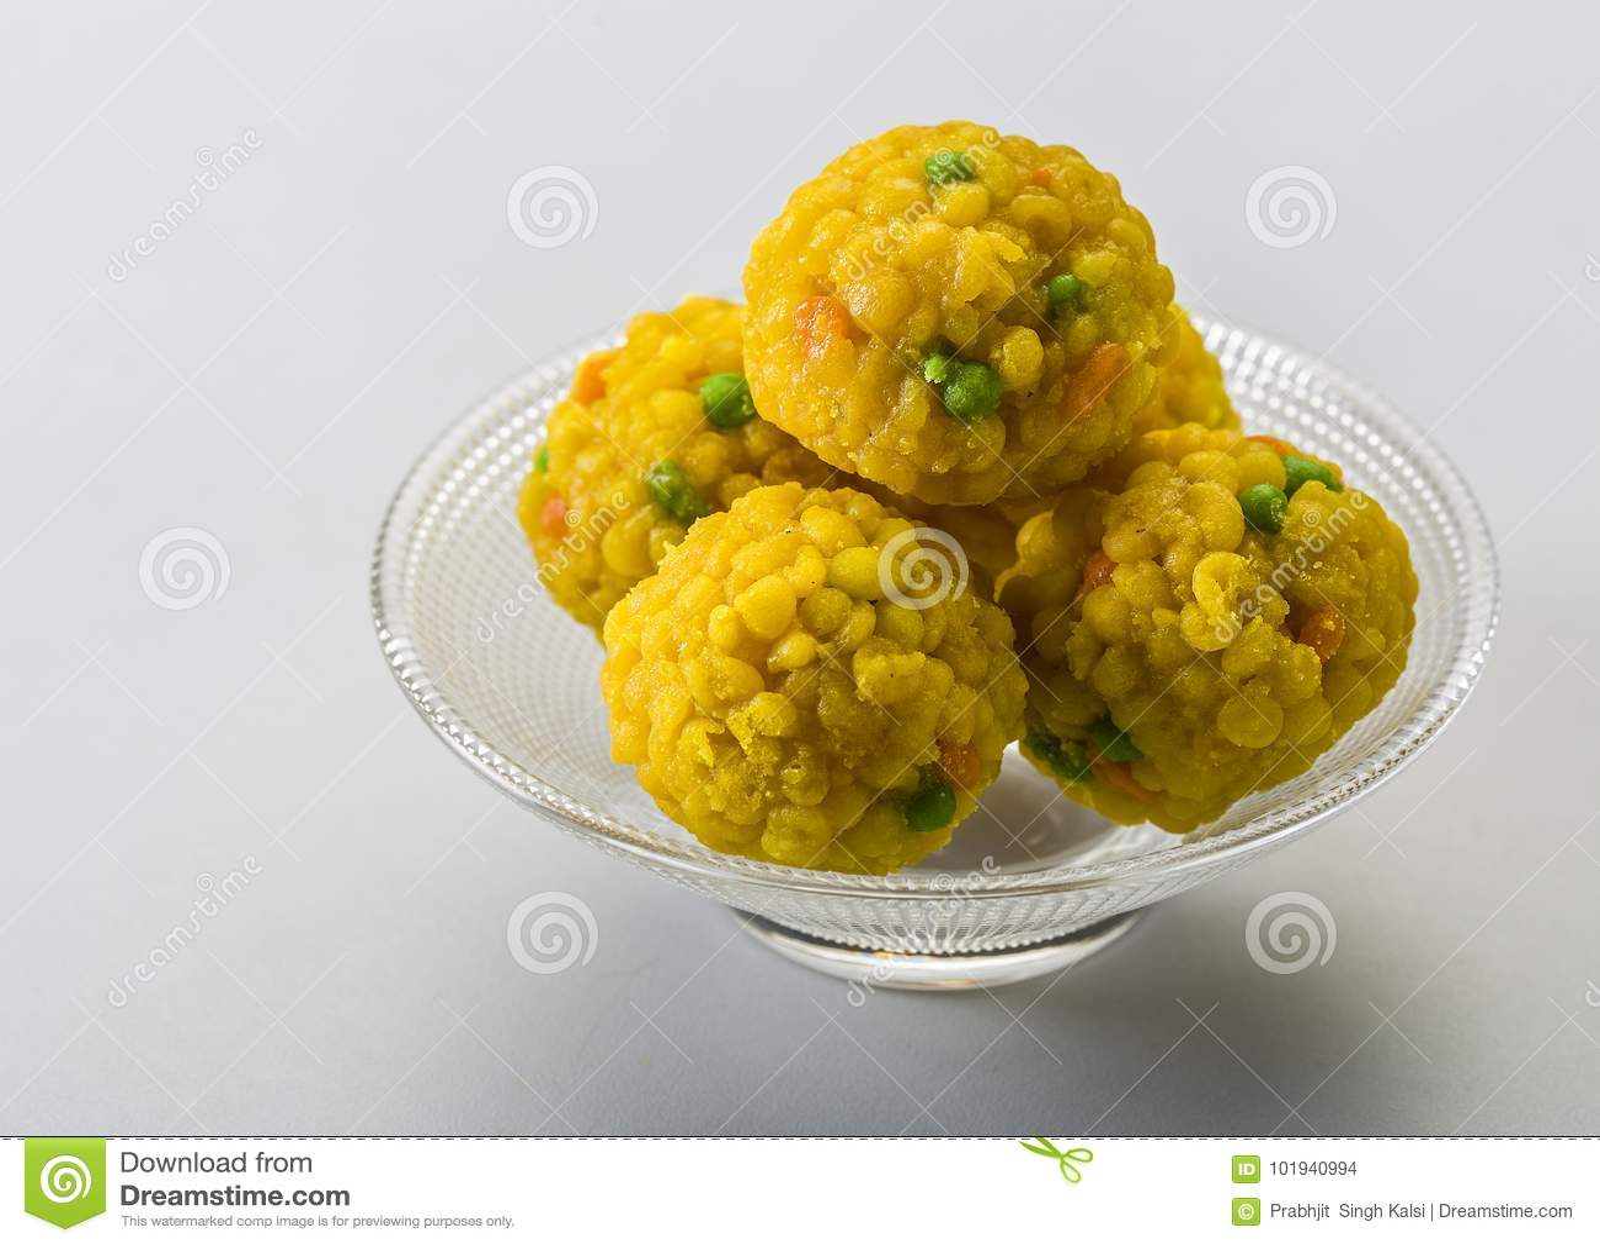 Laddu Or Laddoo Are Ball-shape...